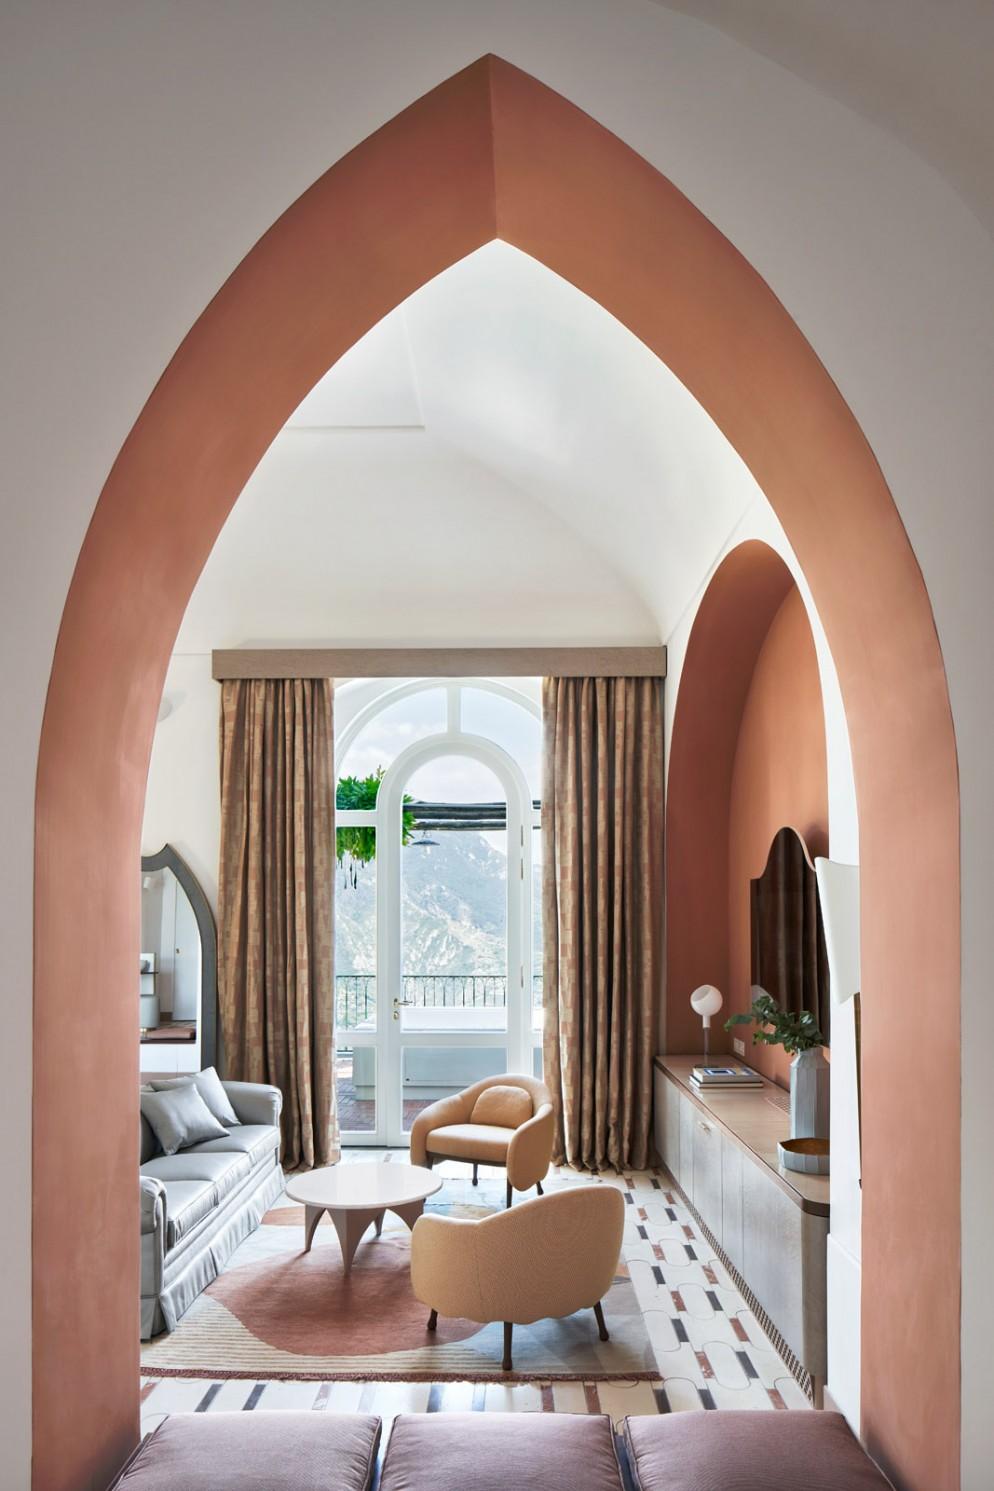 hotel-palazzo-avino-costiera-amalfitana-cristina-celestino-04